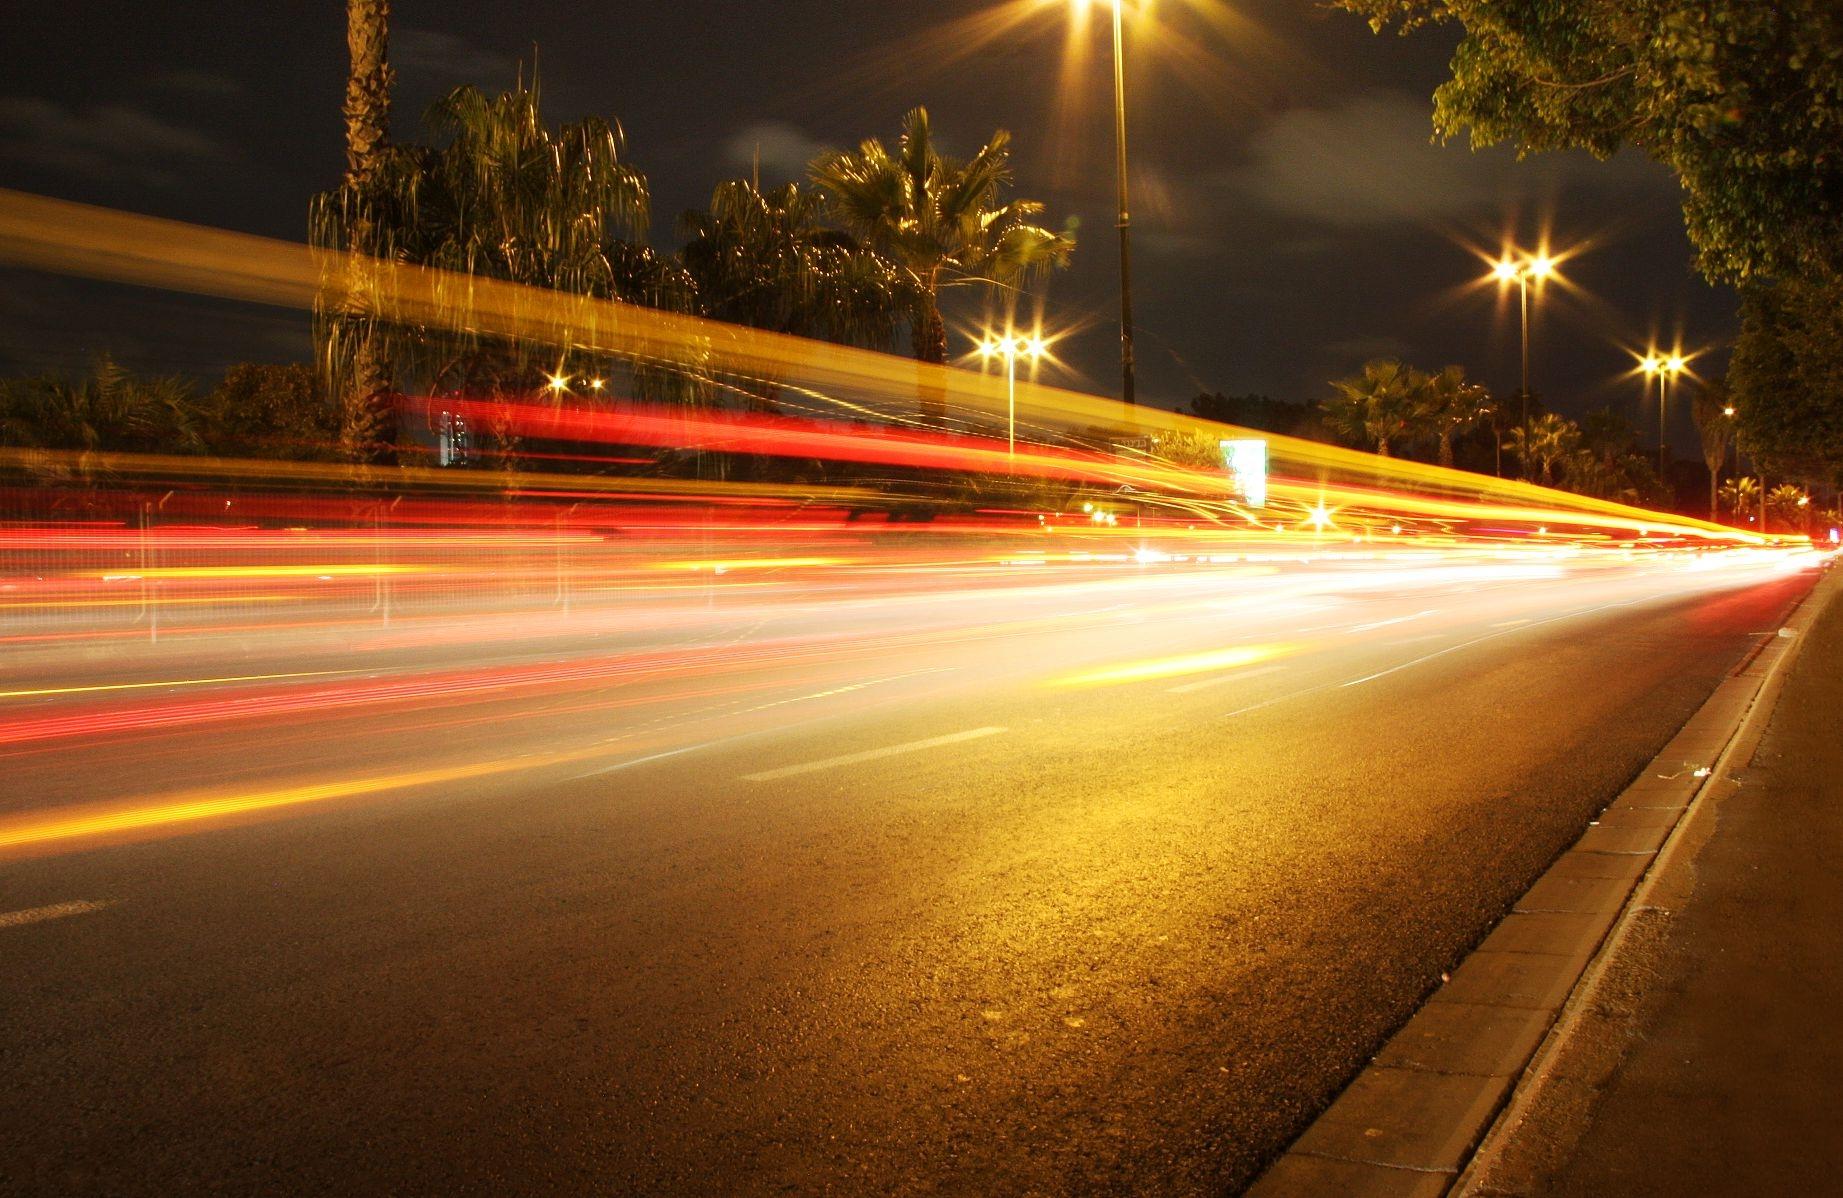 File:Night street lights-other.jpg - Wikimedia Commons